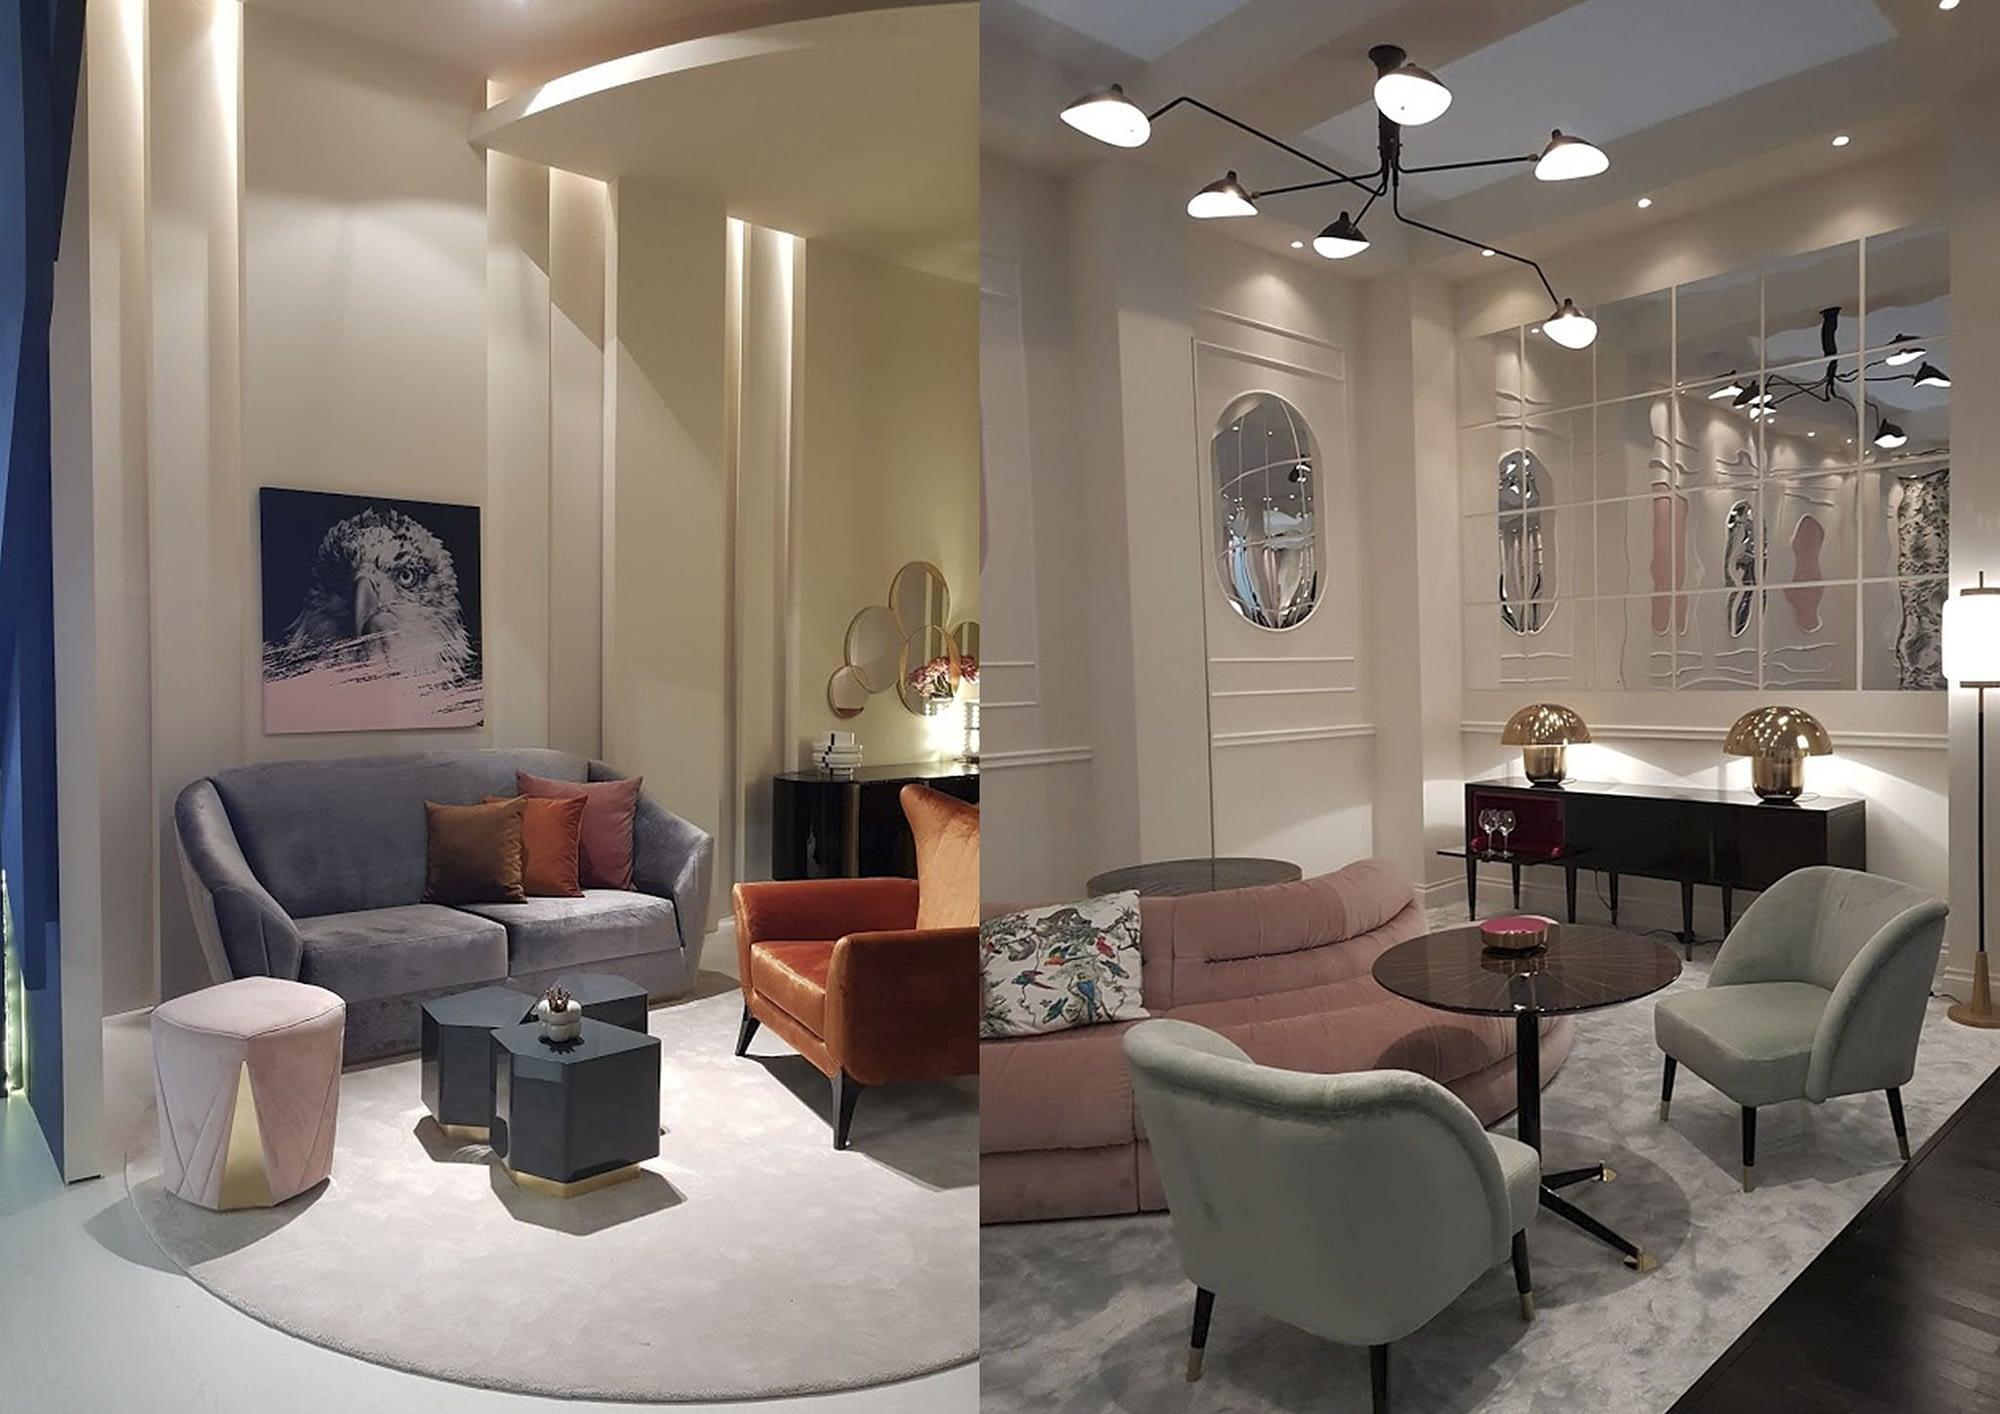 Milano Design Week 2018 - Salone del Mobile 75